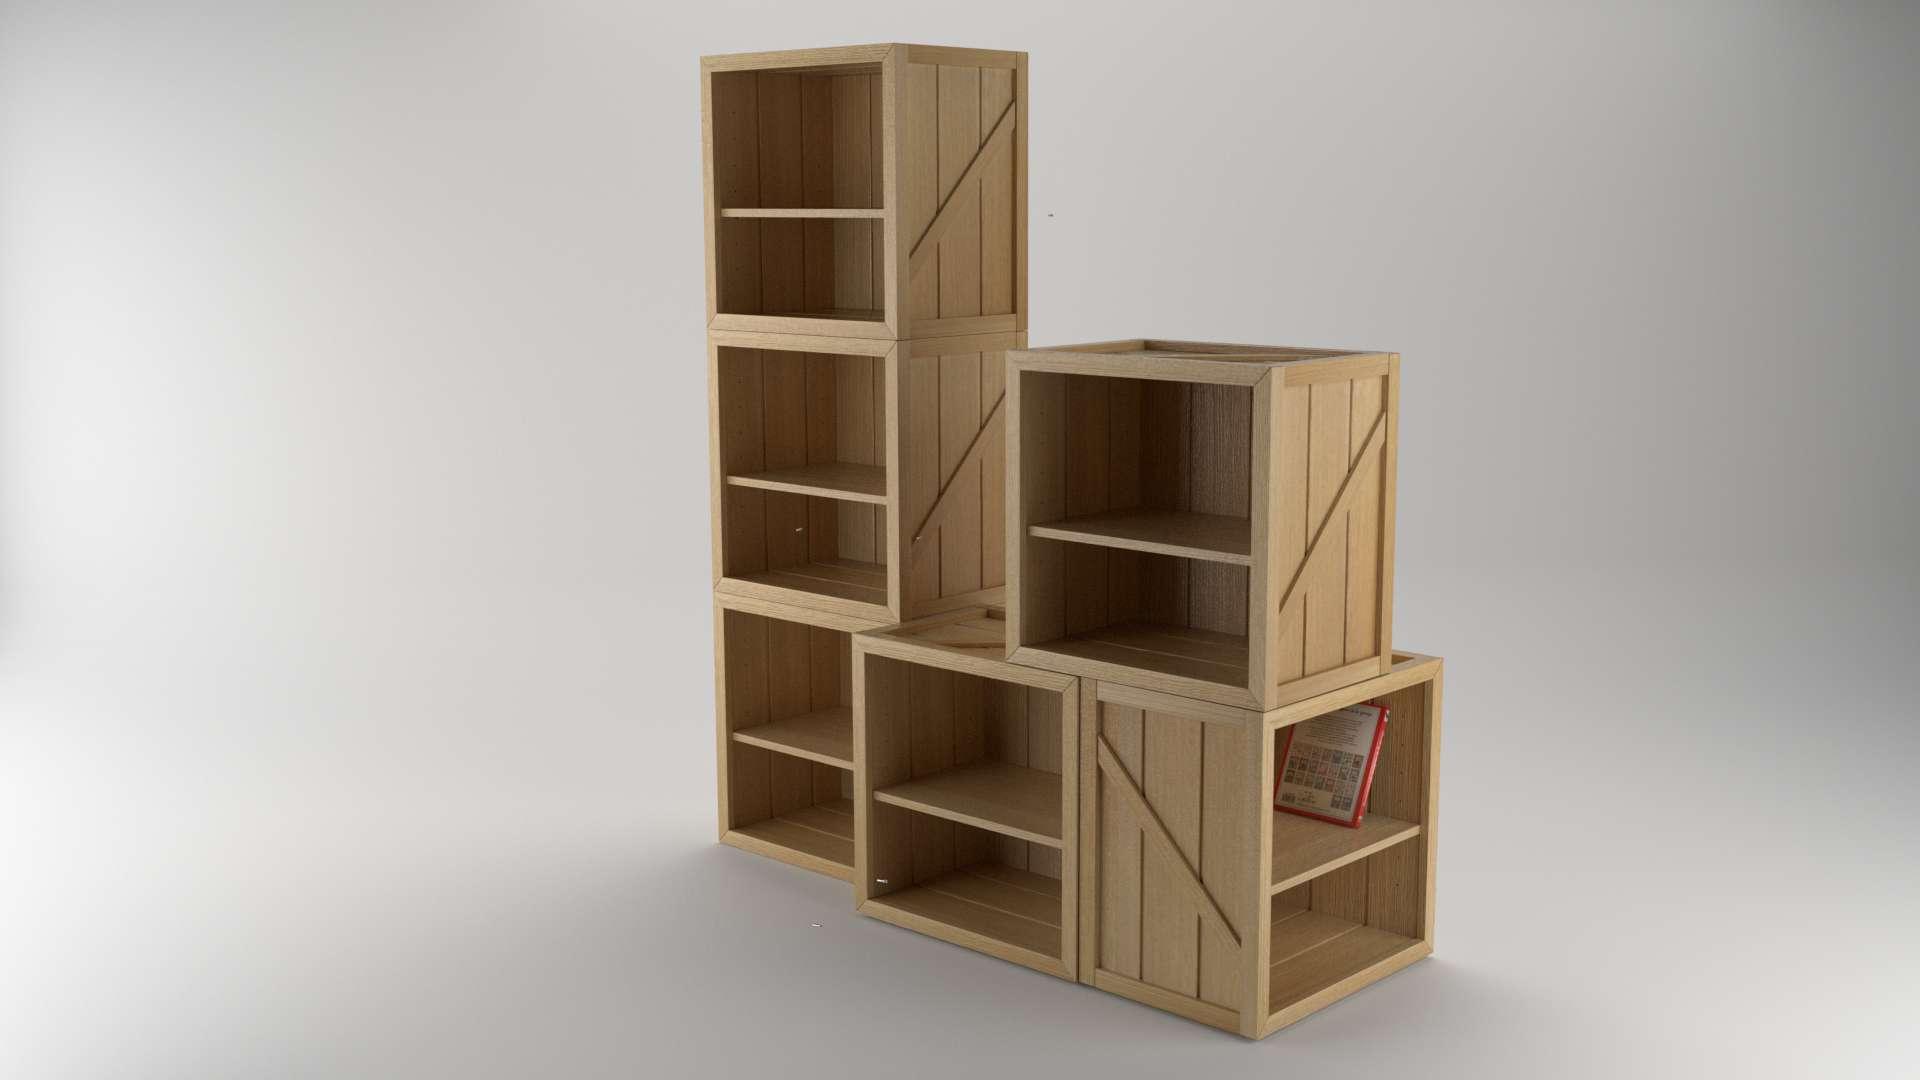 Model Crusoe CabinetShelf Vista 3